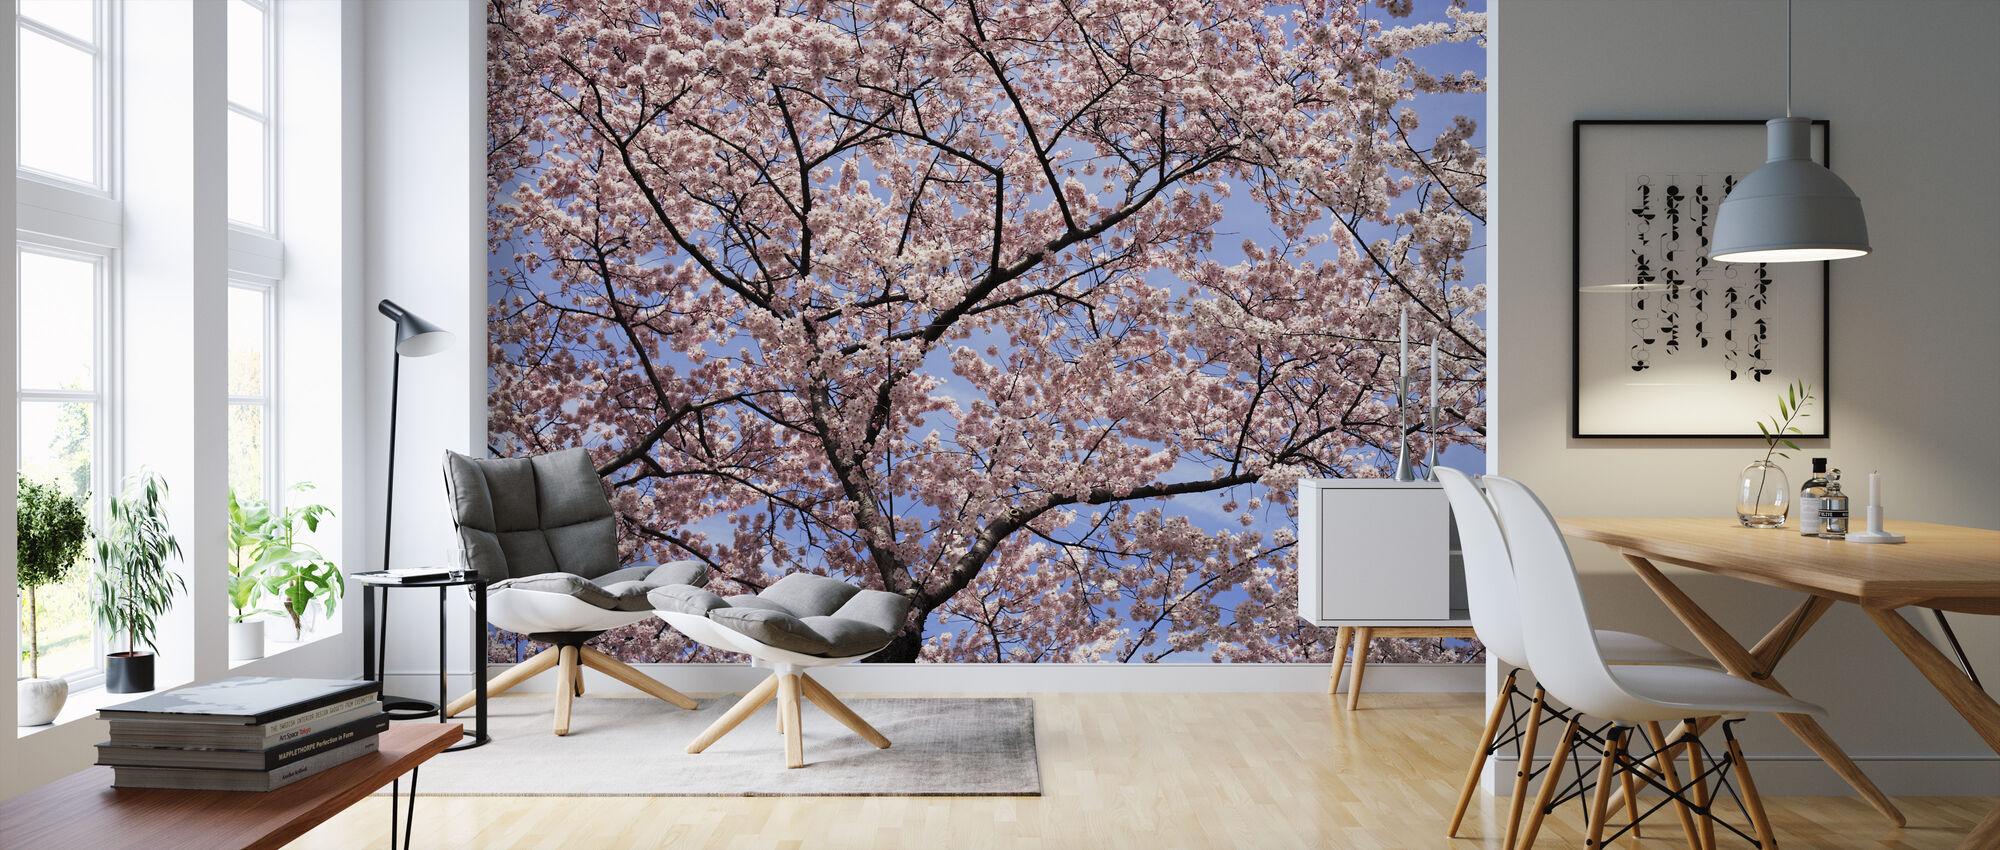 Blooming Cherry Tree - Wallpaper - Living Room